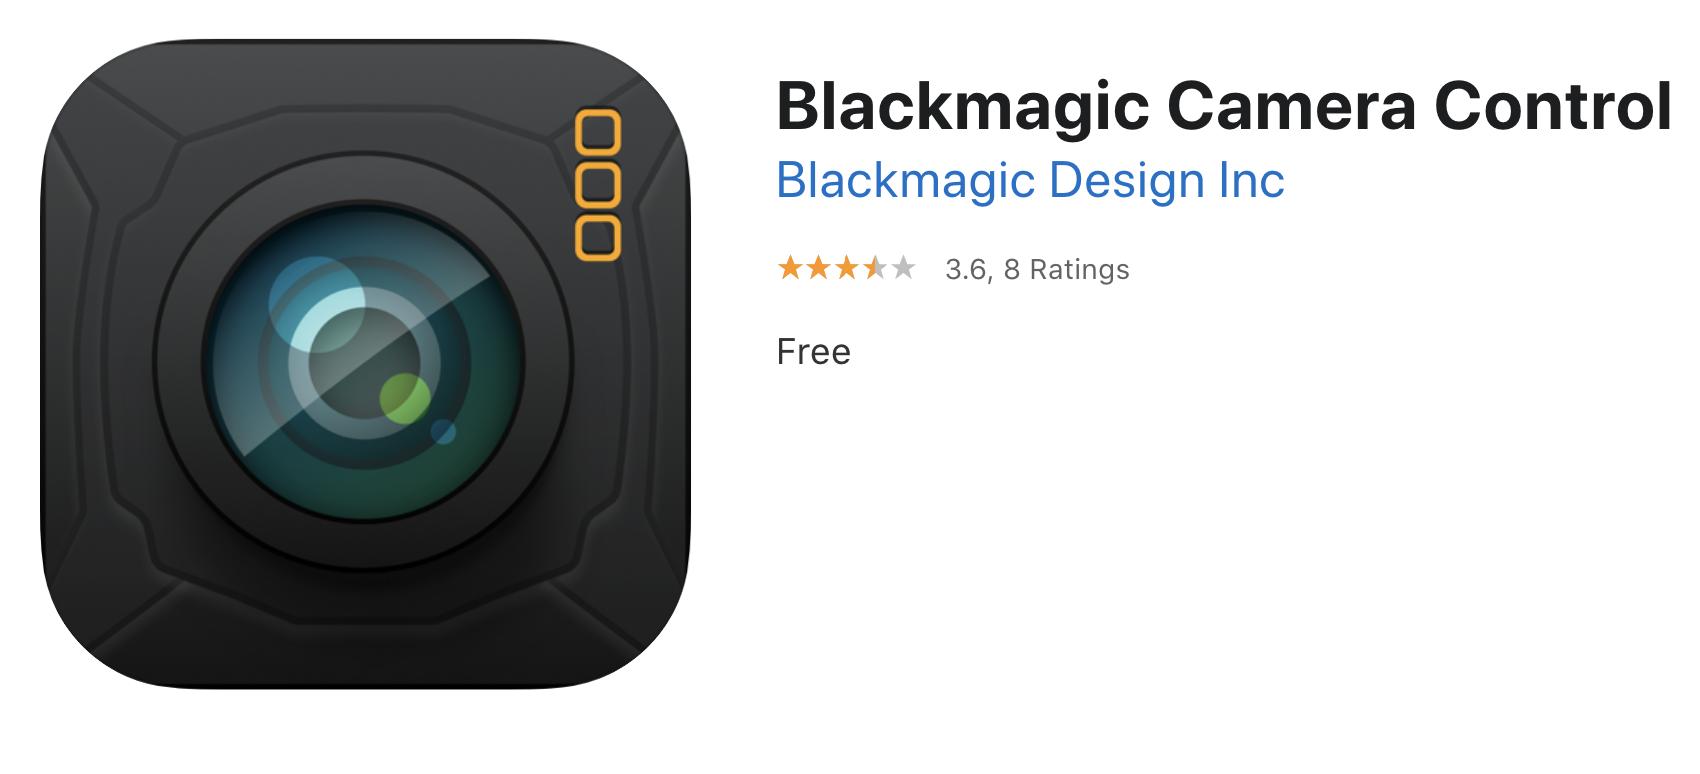 Blackmagic Camera Control 1 03 Update Newsshooter